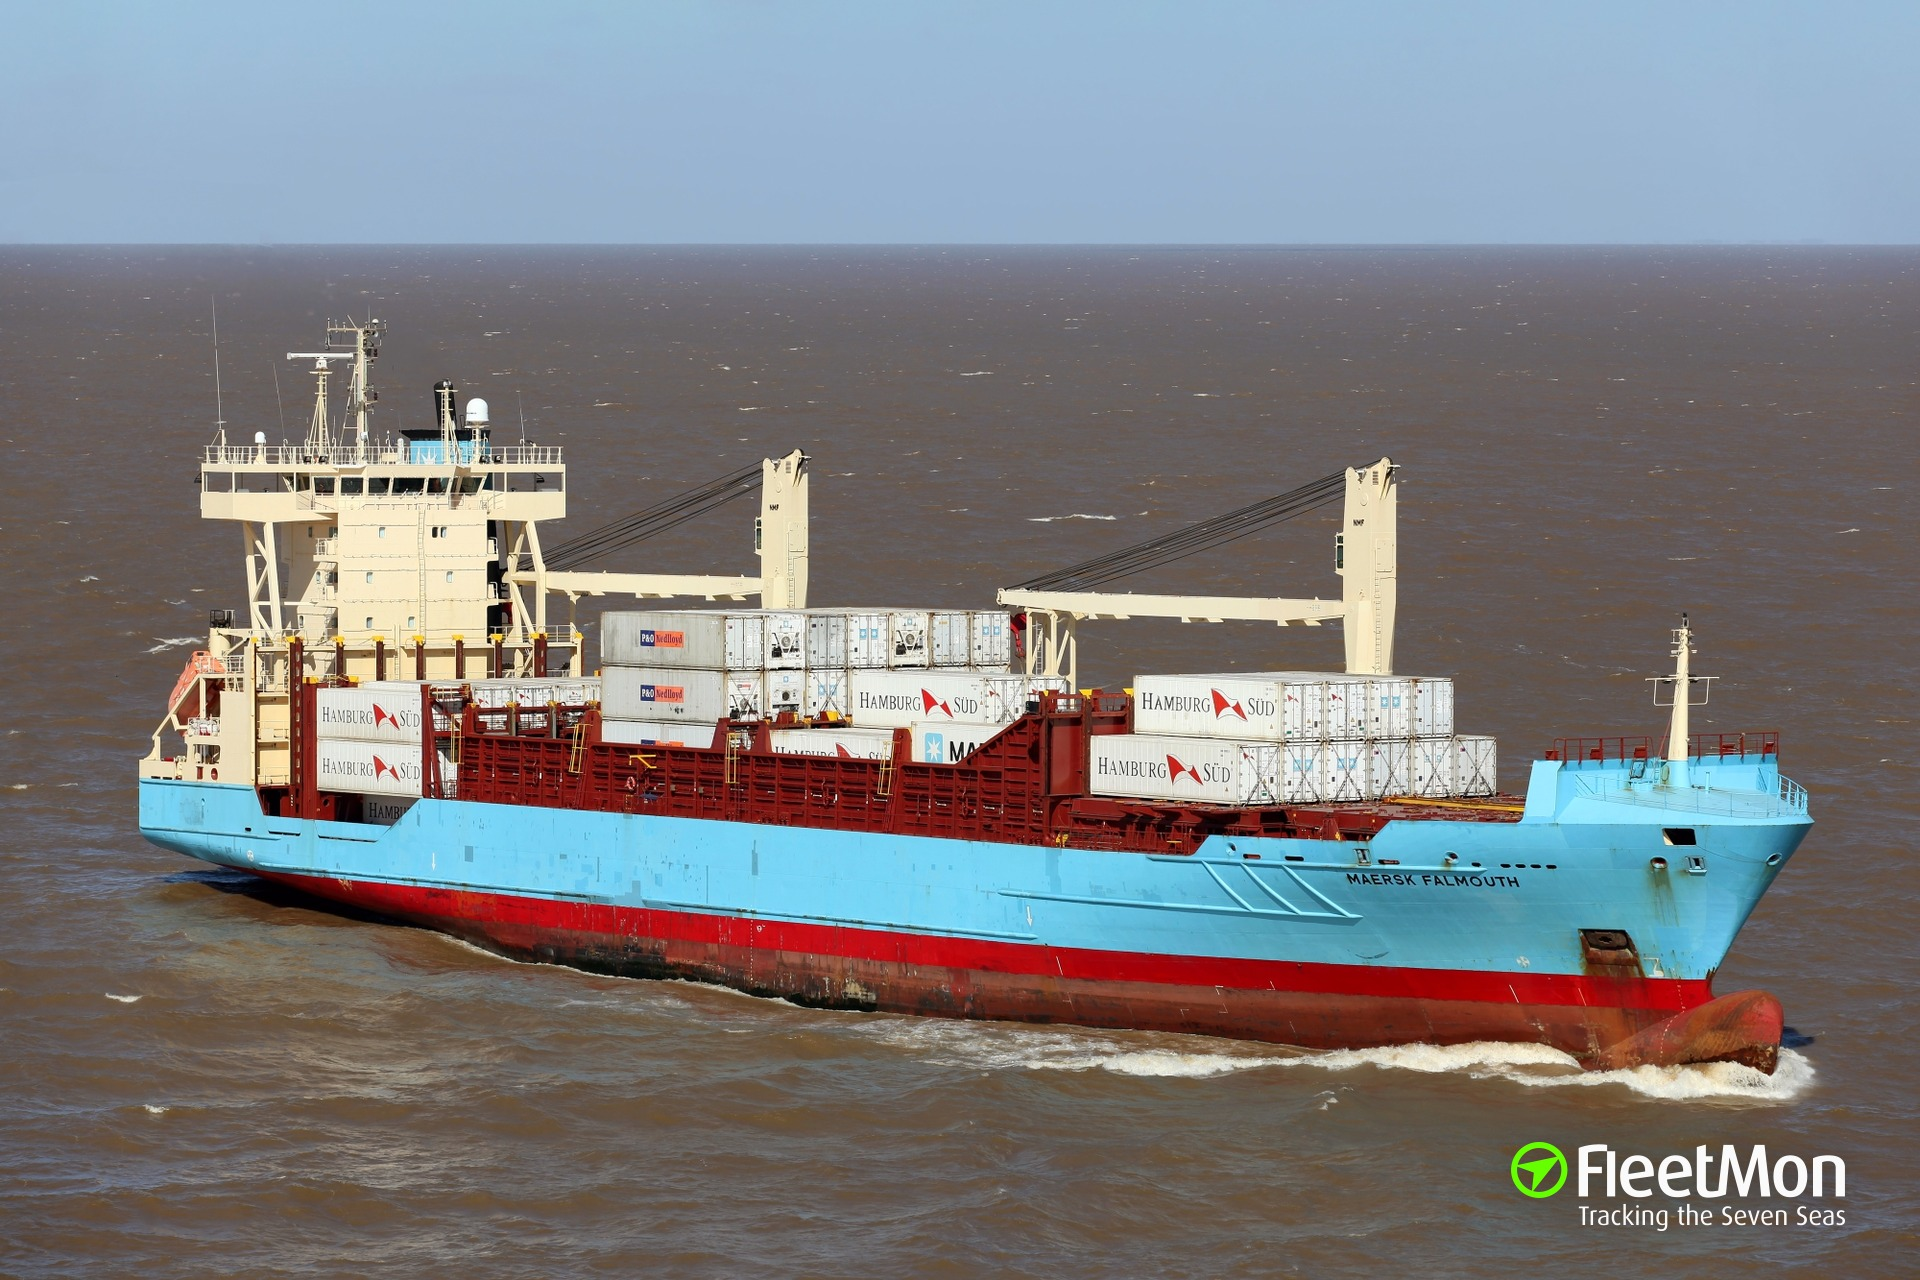 Maersk Starts Running Calypso Service and Modifies its Panama - Venezuela Service